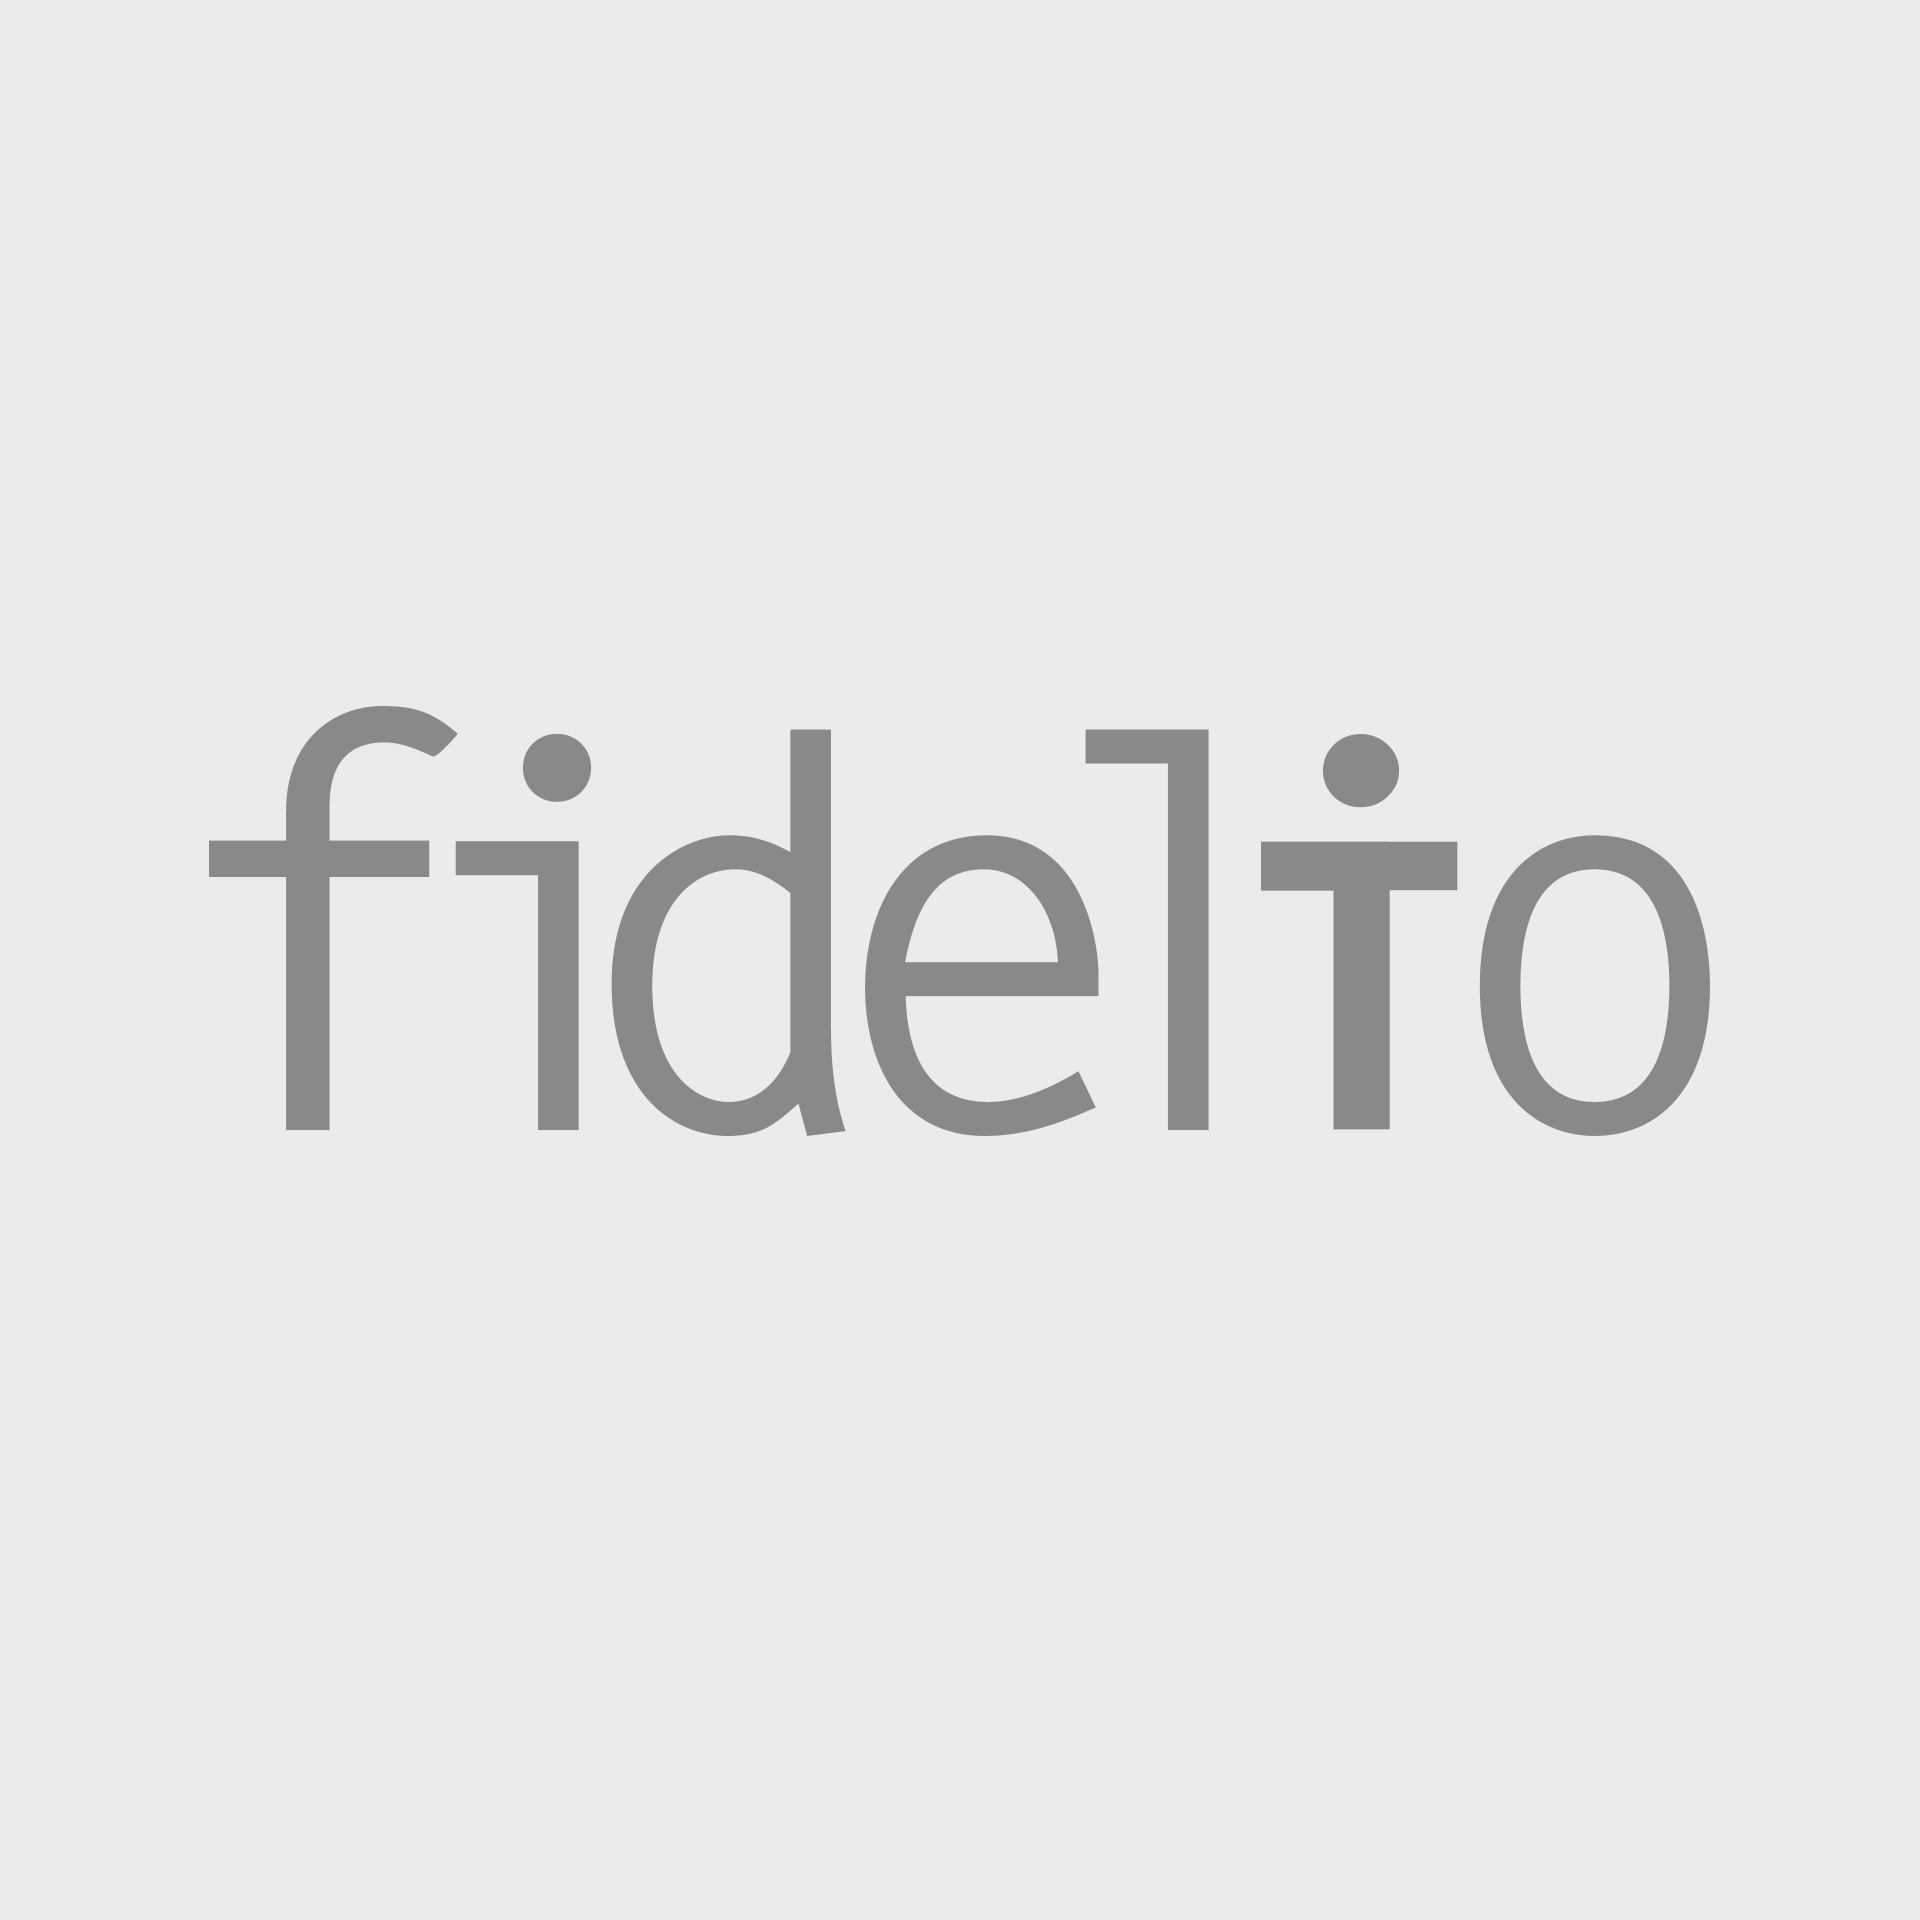 Frida Kahlo: Henry Ford Kórház